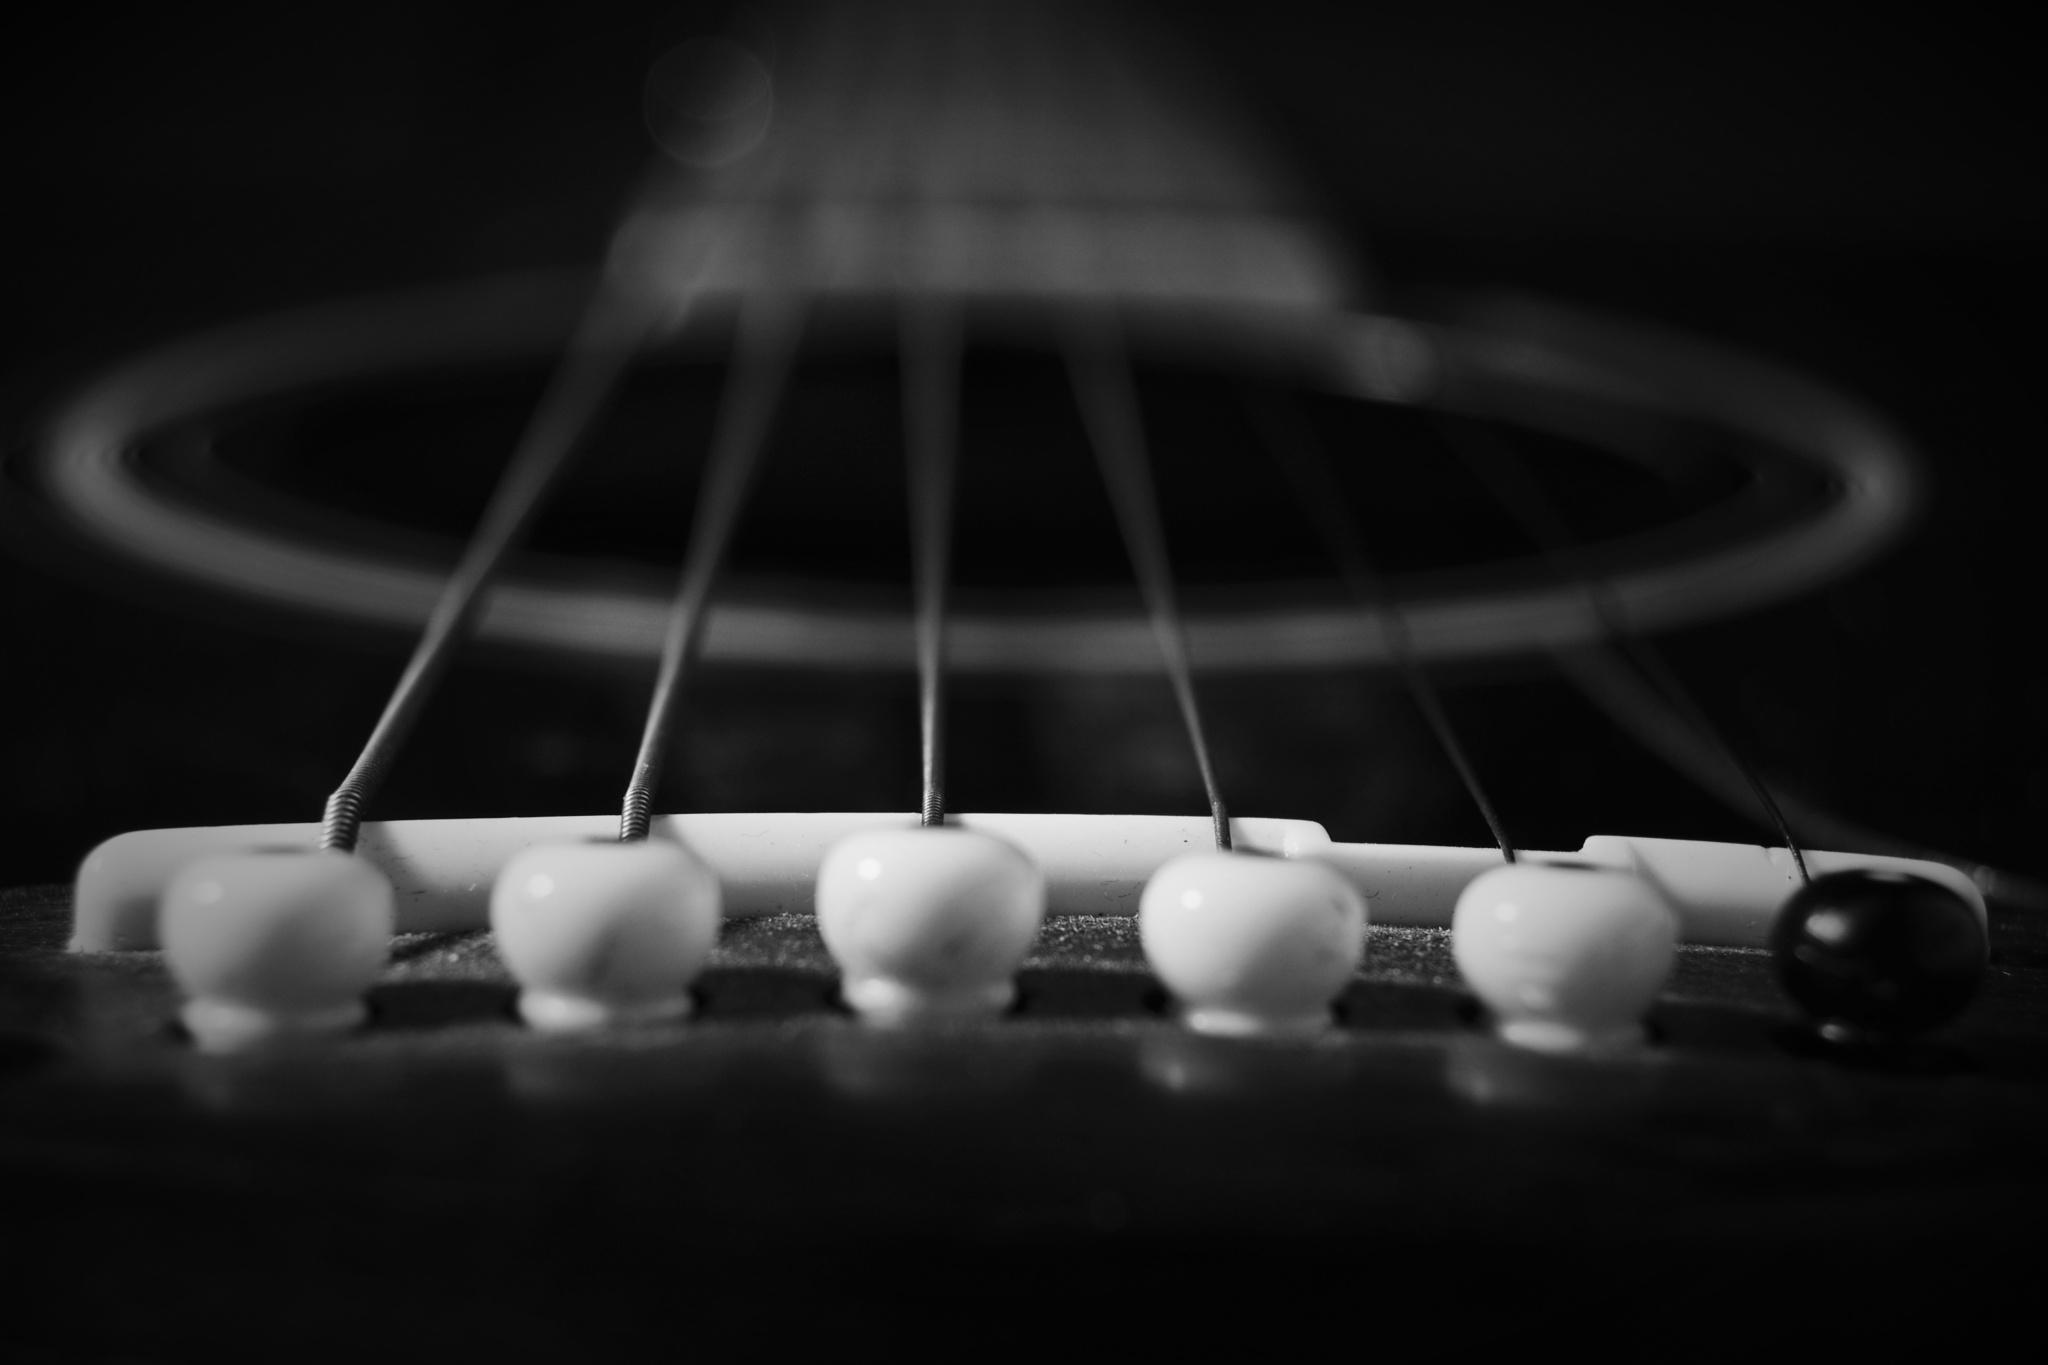 Guitar by Nicolai Andresen